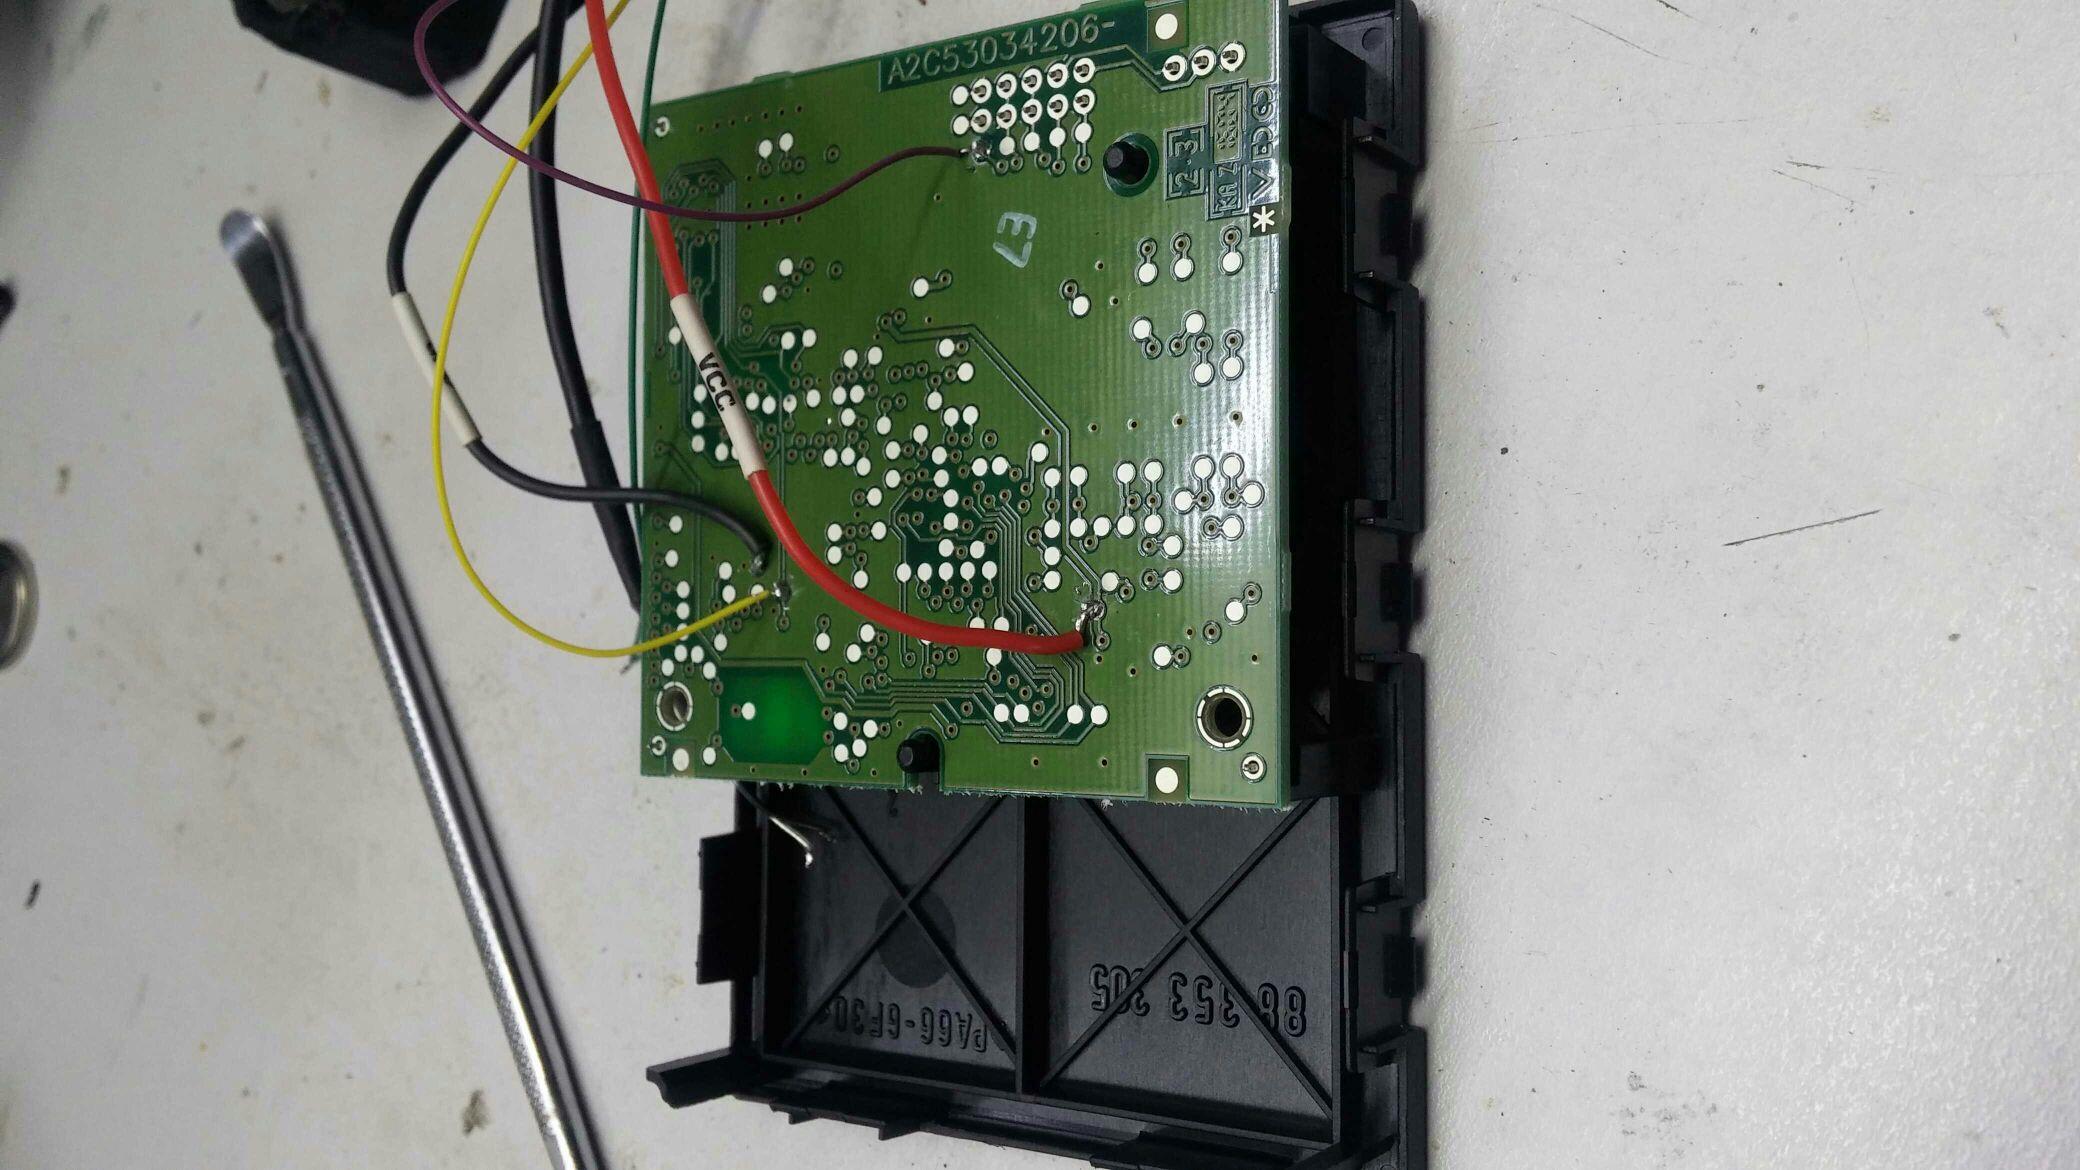 Vvdi Prog Sitemap Page 4 Digital Kaos Hardware Block Diagram Of The 9s12 Hcs12 Single Board Computer